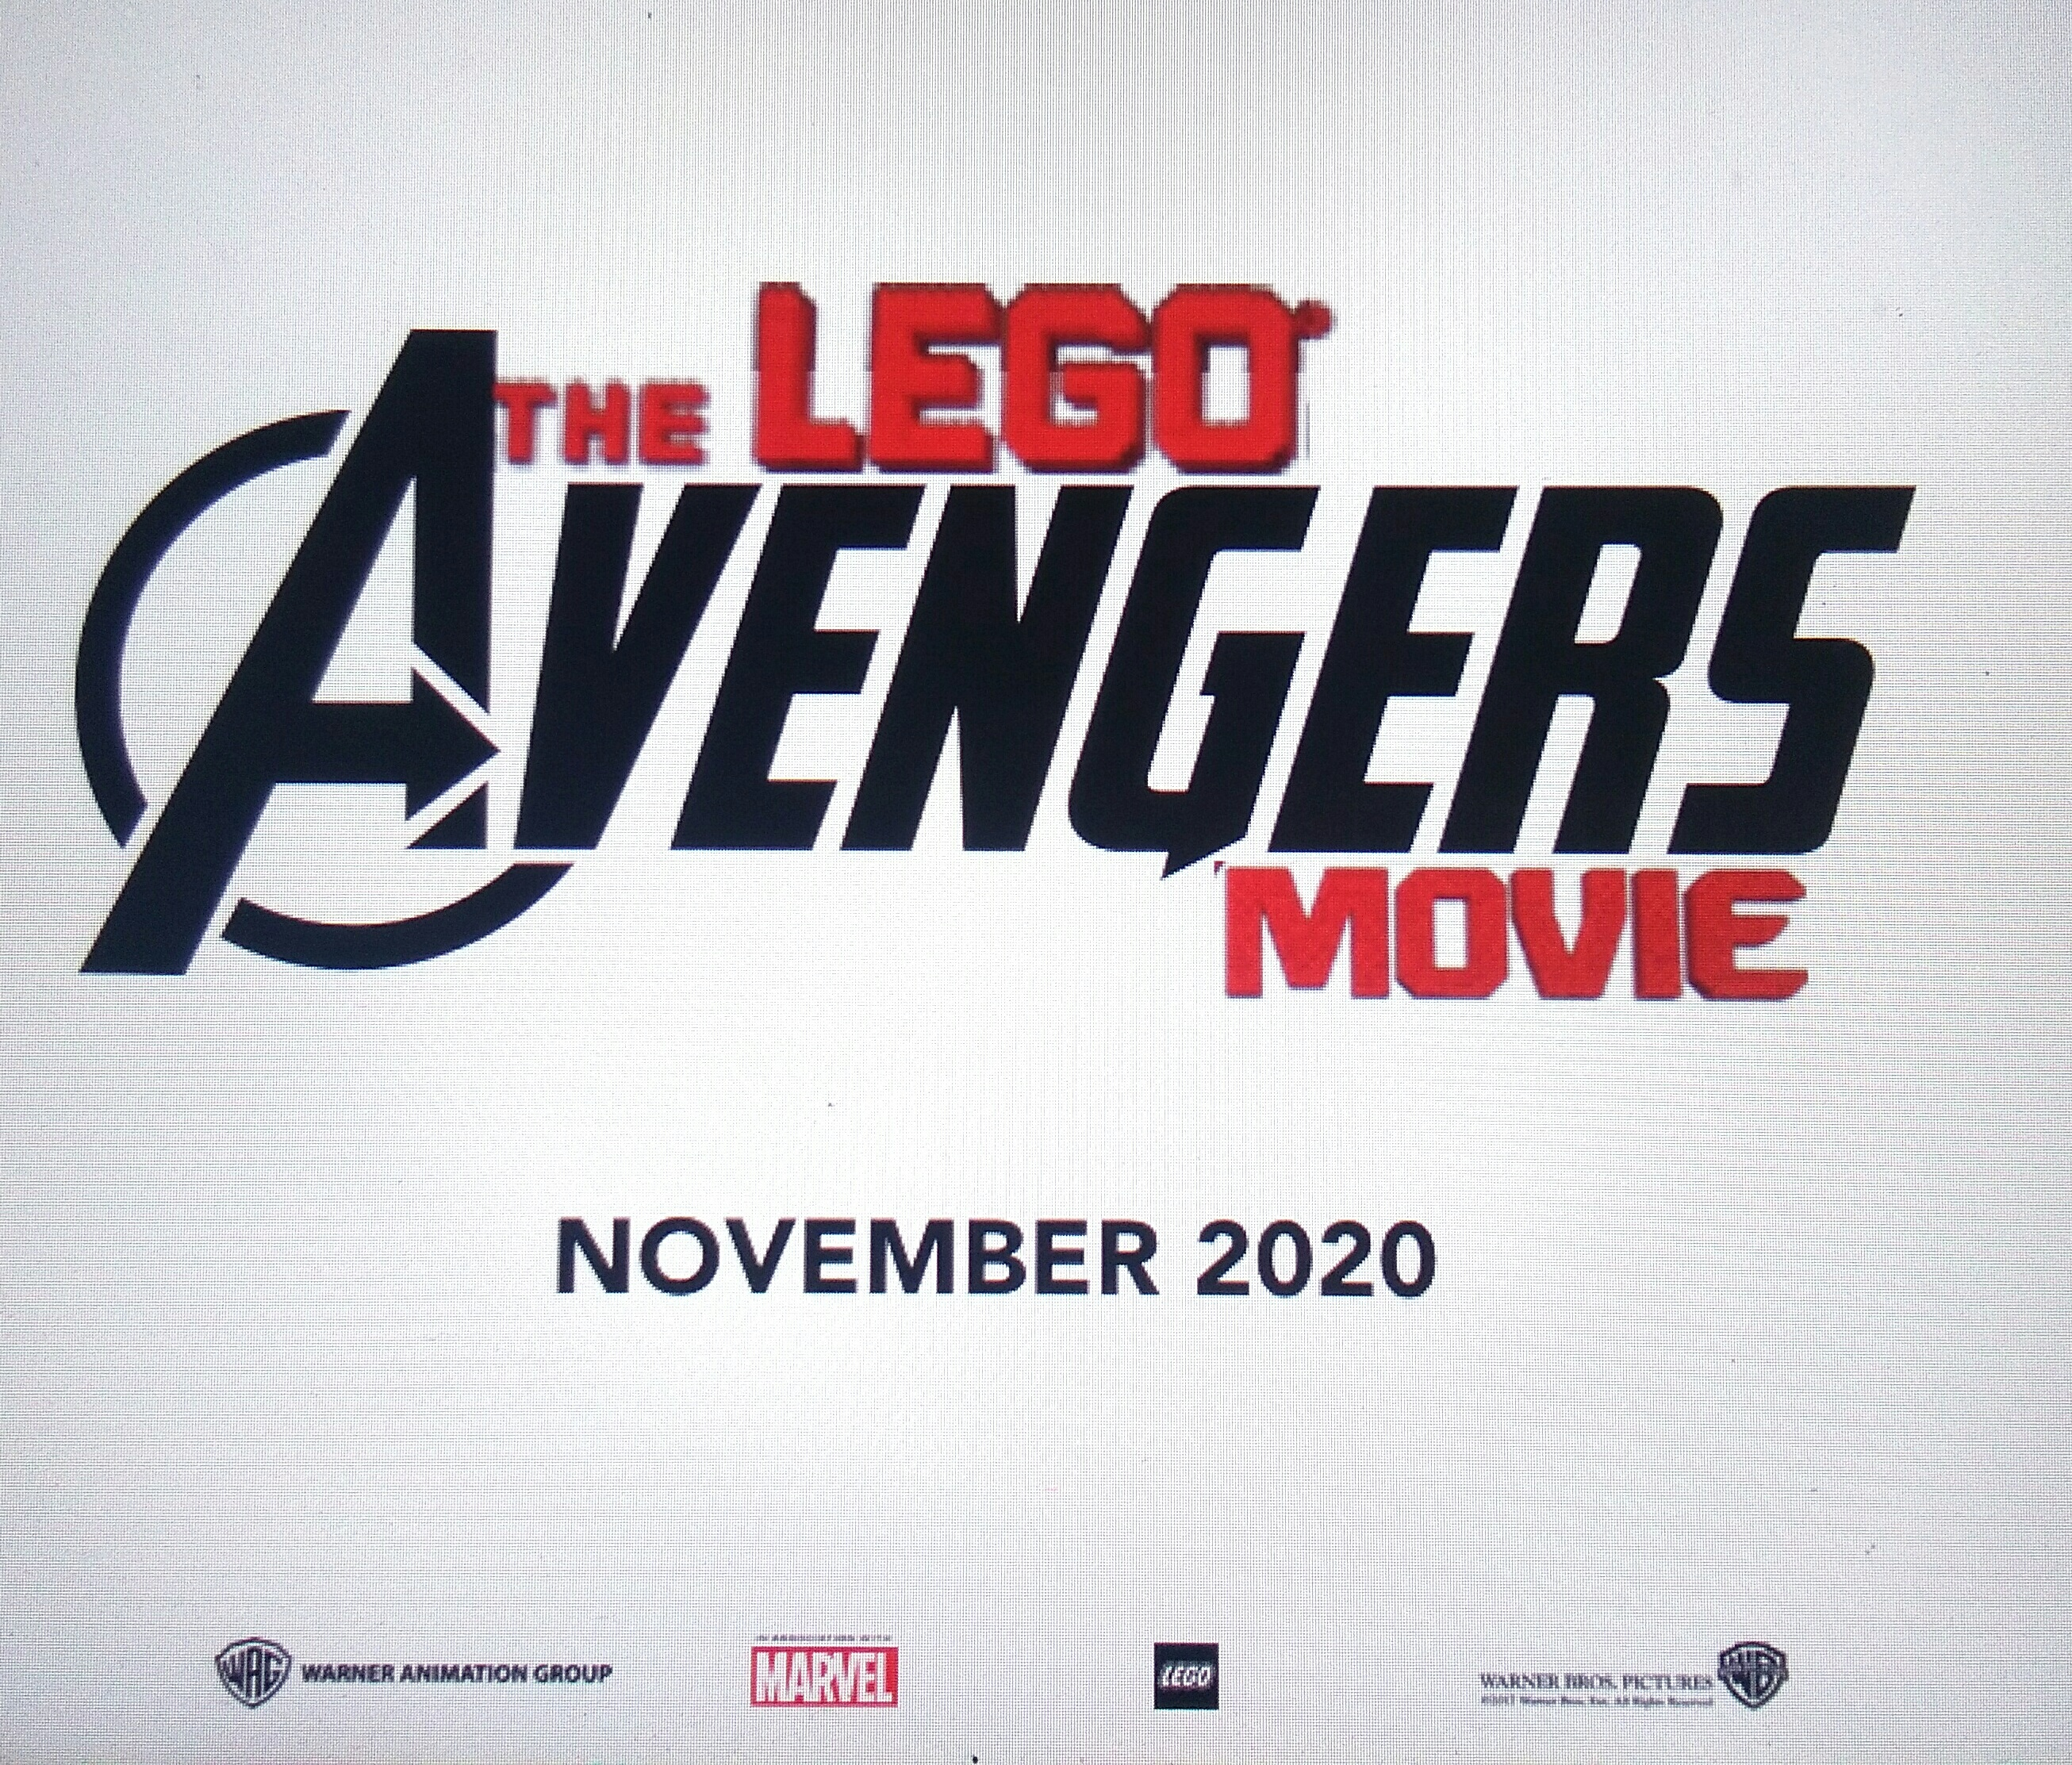 The LEGO Avengers Movie